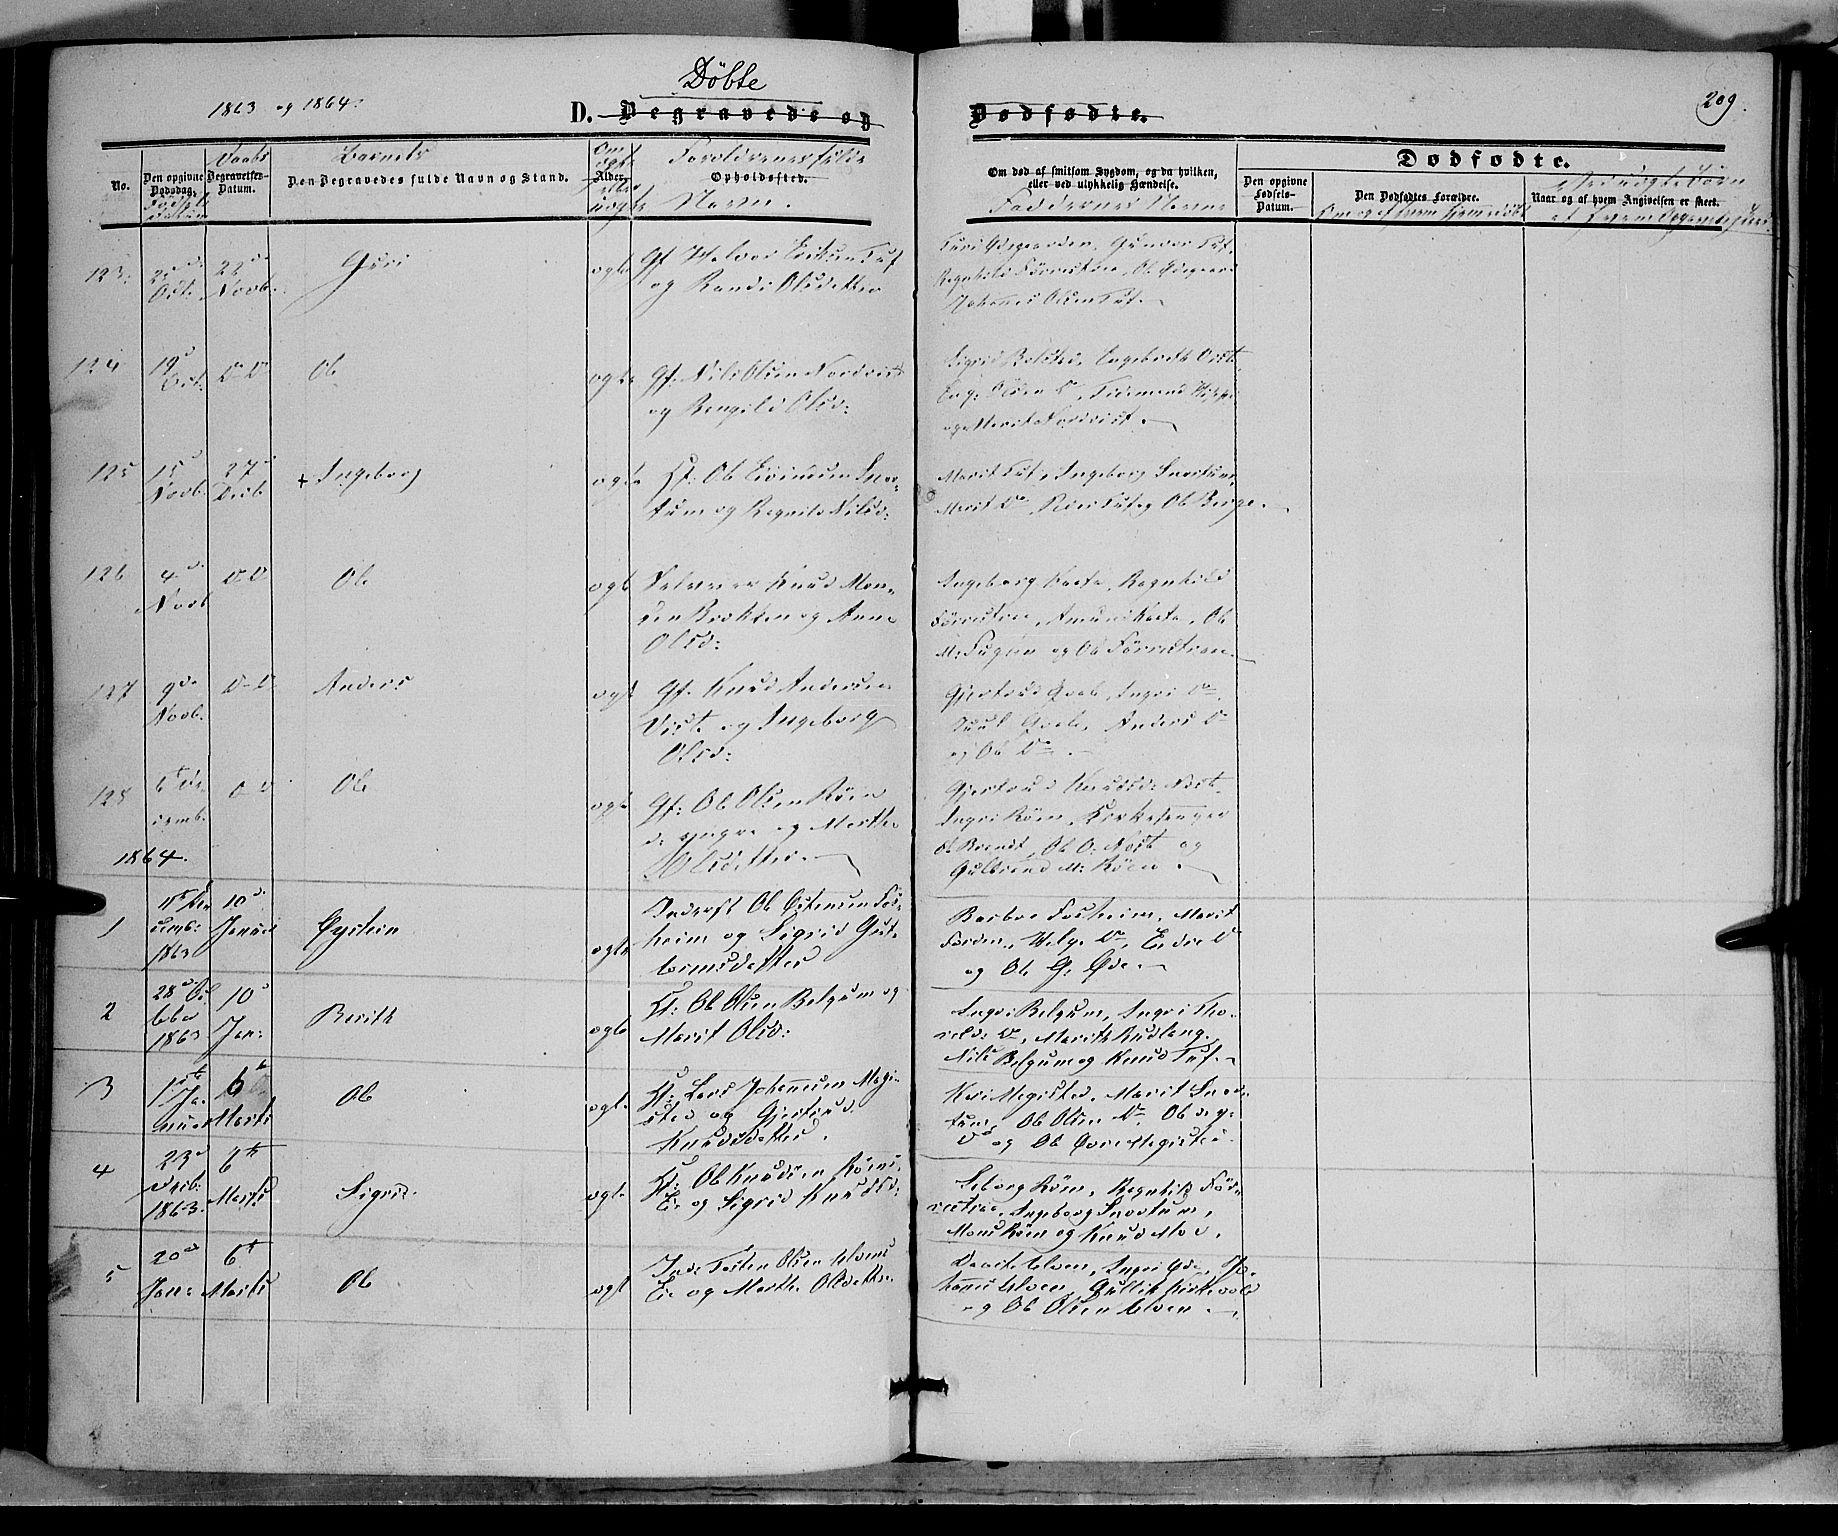 SAH, Vestre Slidre prestekontor, Ministerialbok nr. 2, 1856-1864, s. 209